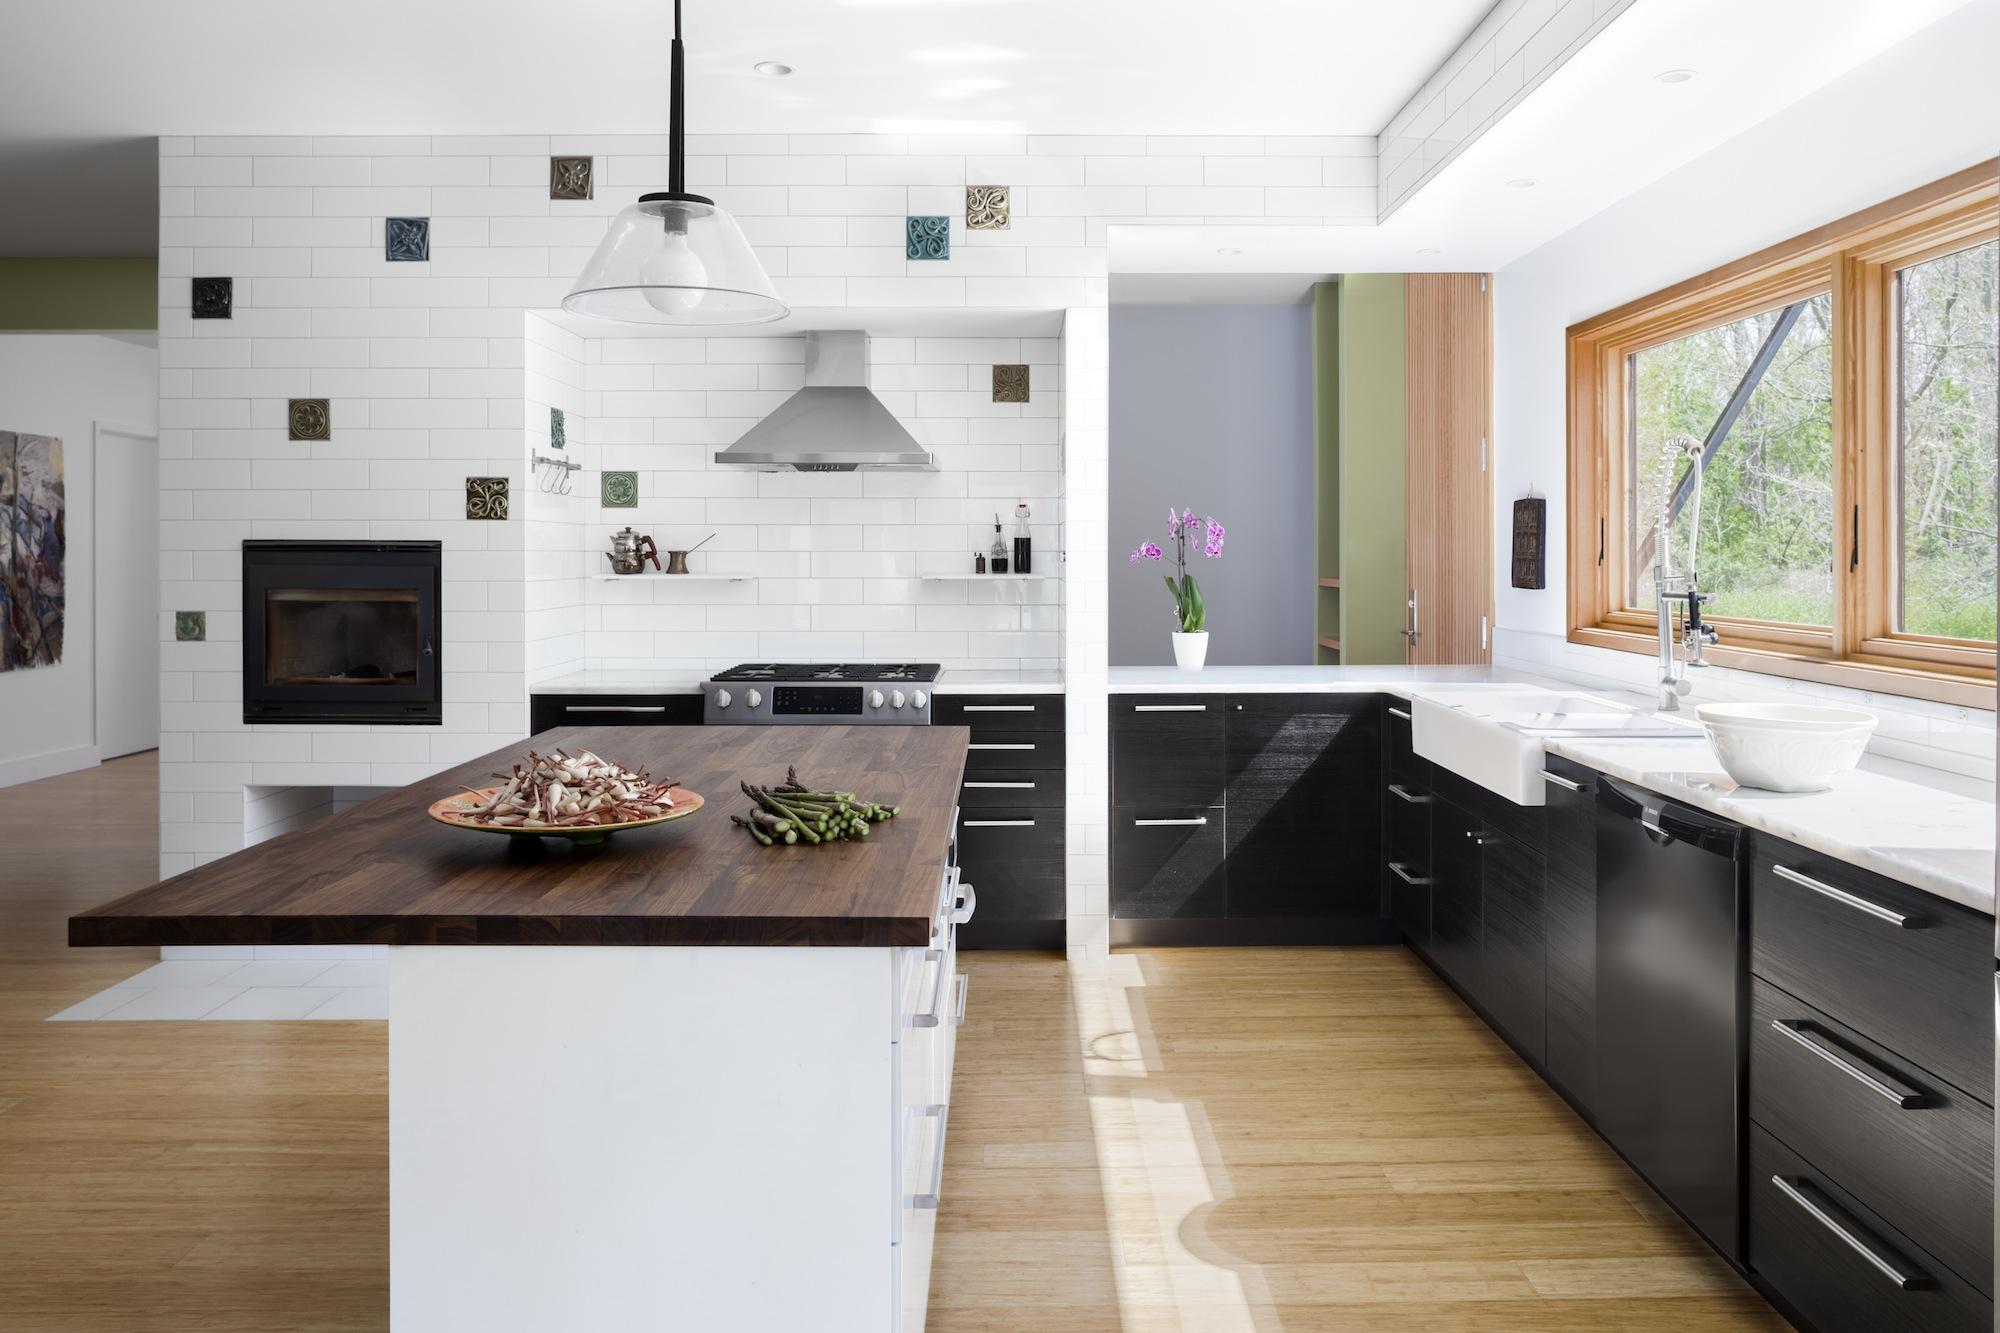 schickel-construction-seneca-lake-kitchen.jpg